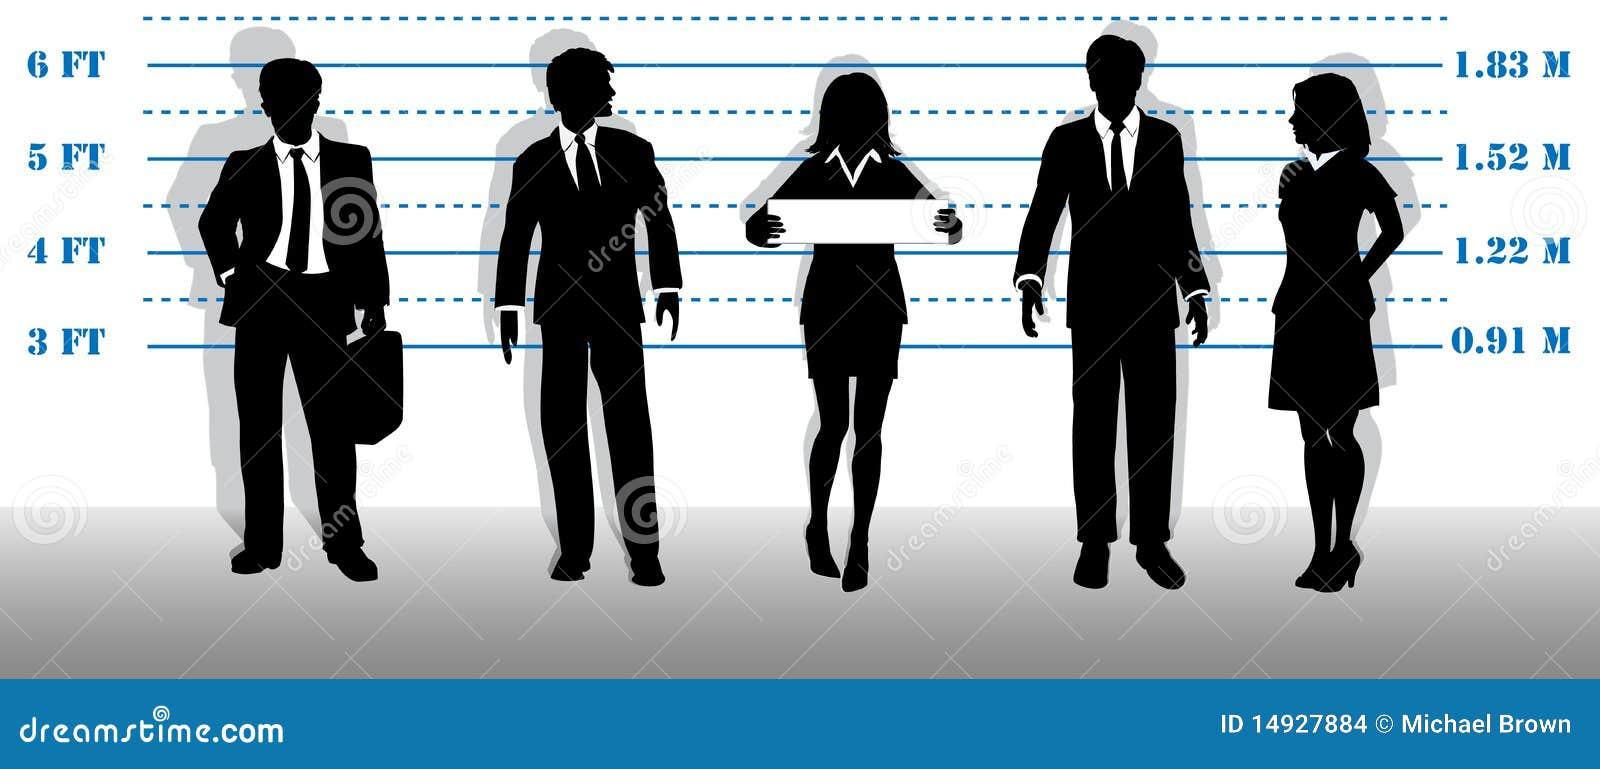 wanted business people lineup mugshot stock illustration